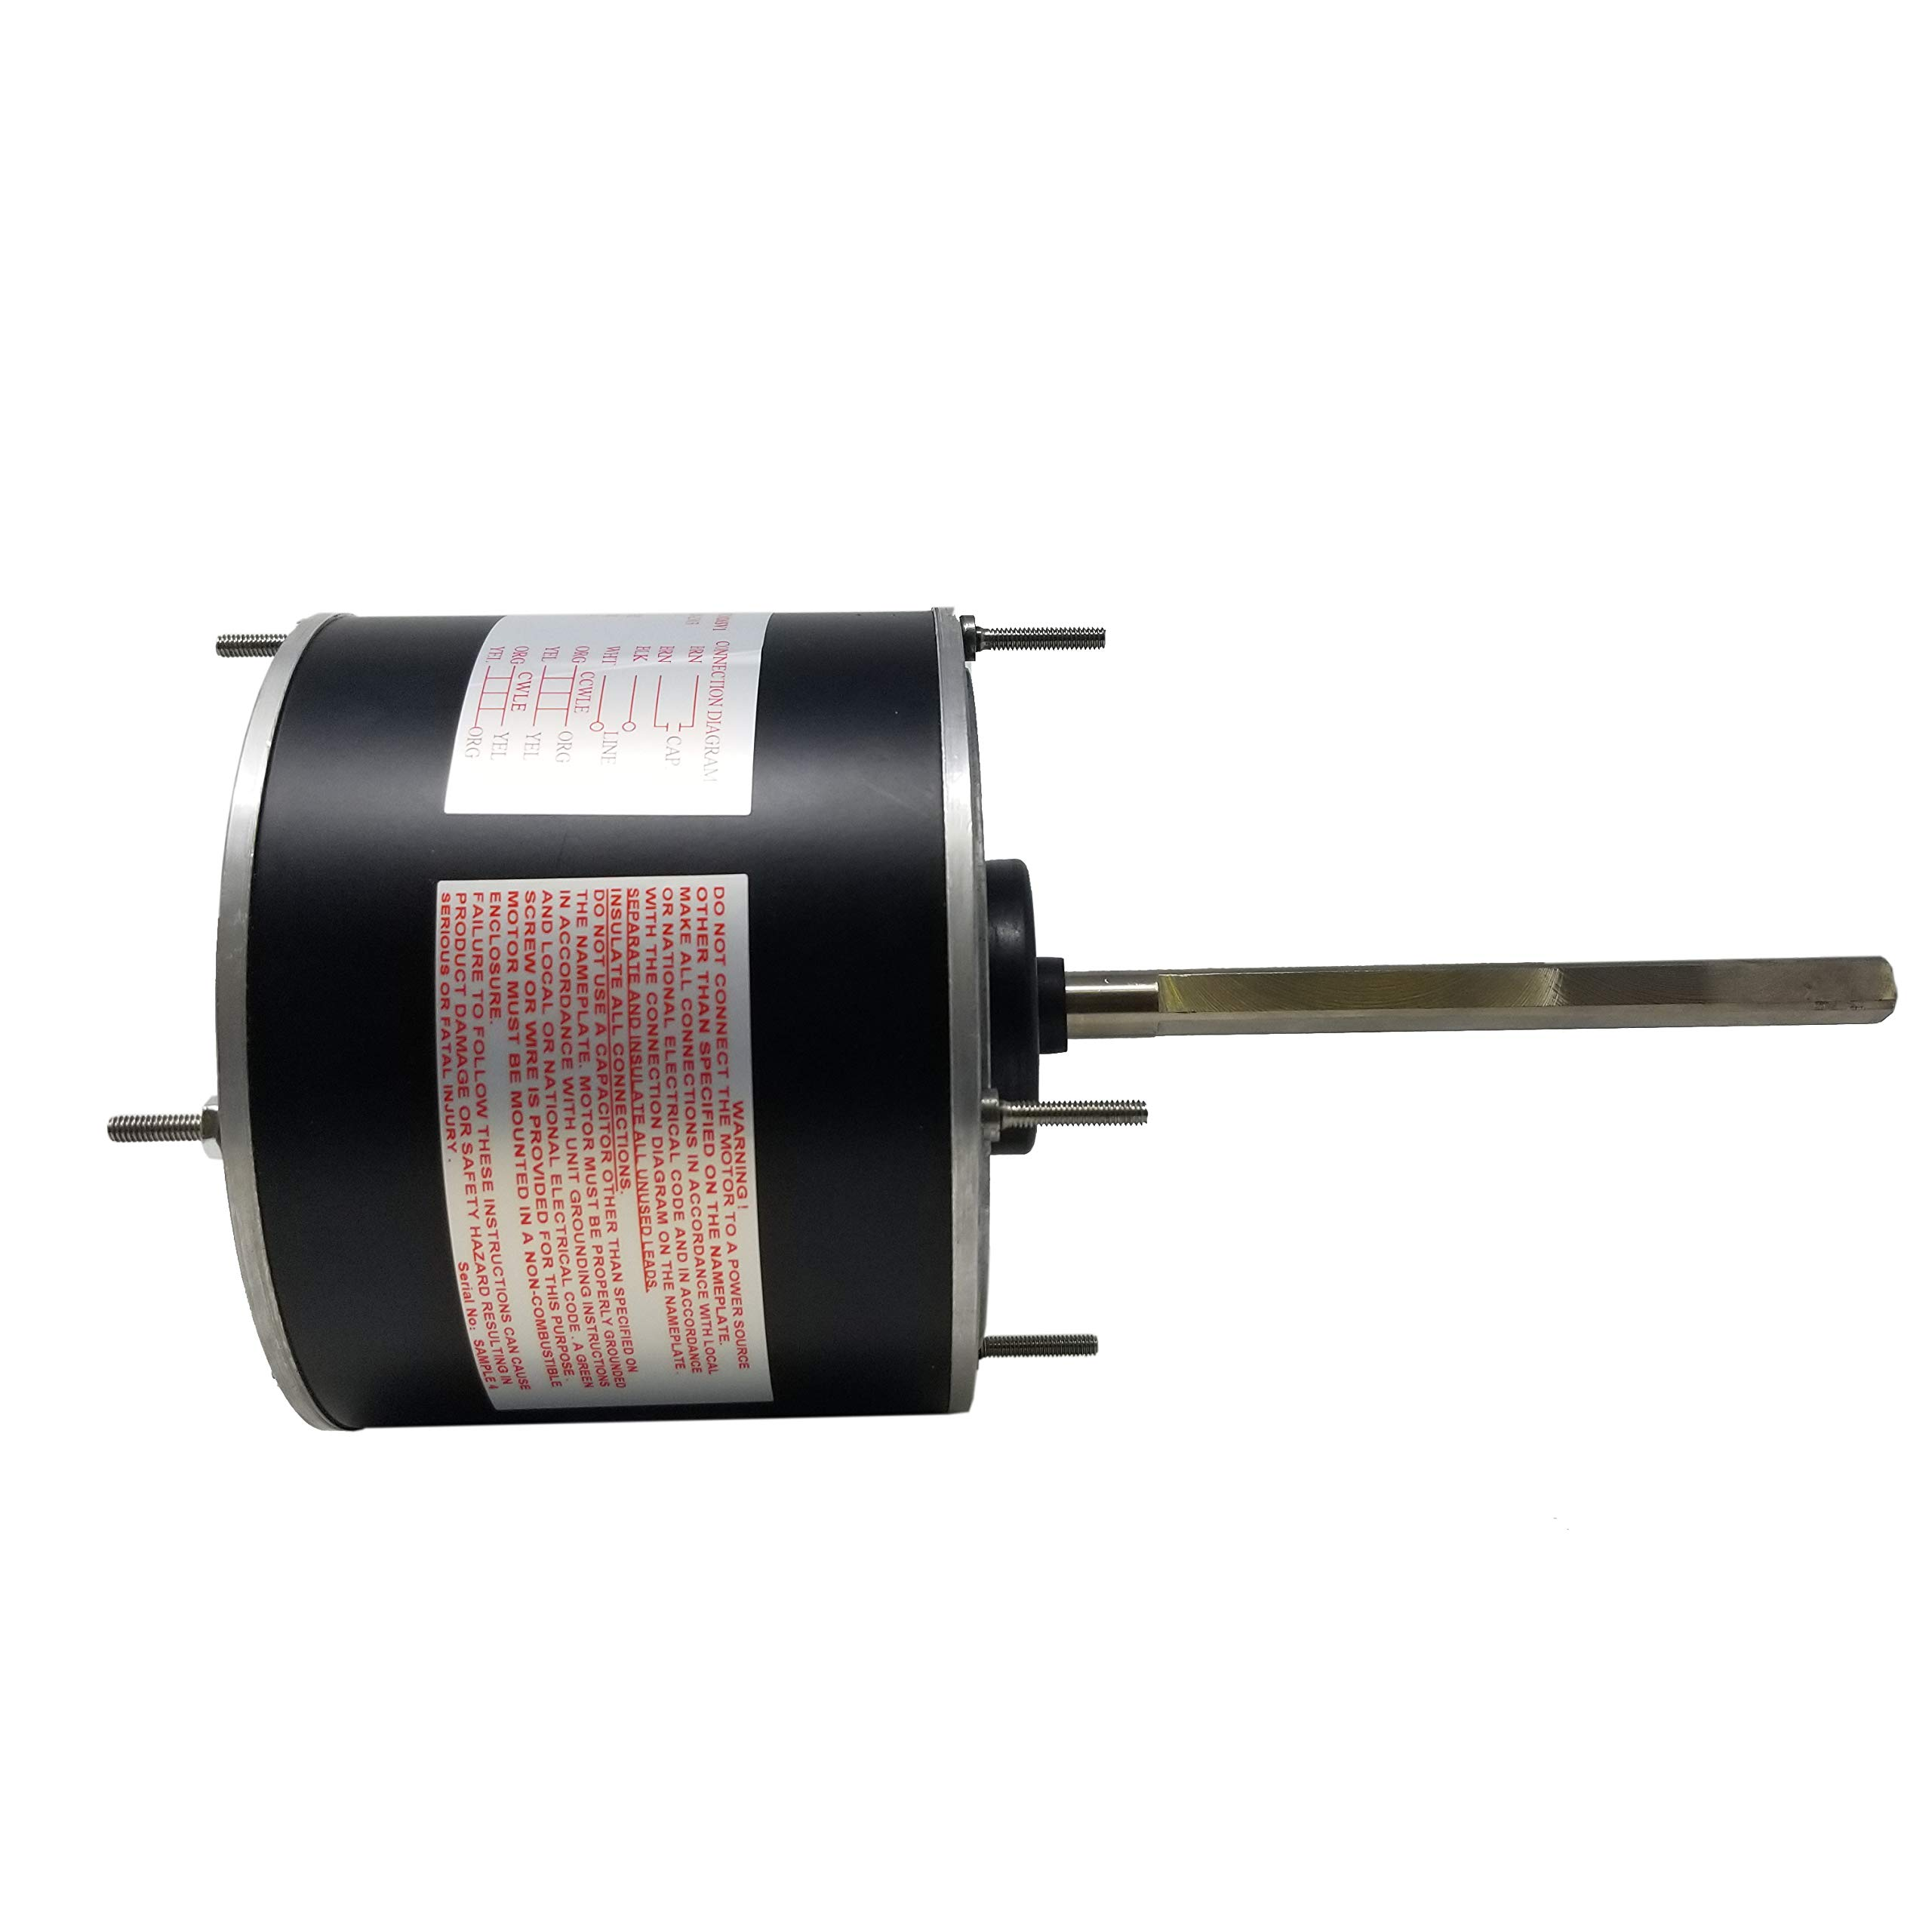 48 Frame Condenser Motor | Replaces: A.O. Smith FSE1026SV1 by P-Tech (Image #6)